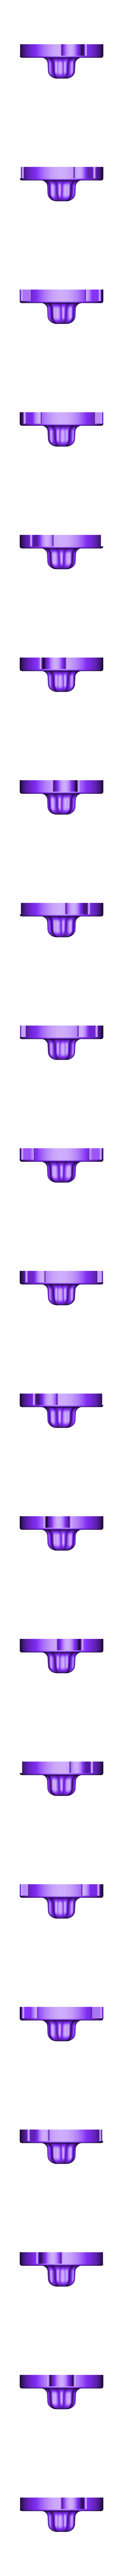 roue_3.stl Download free STL file Pocket Downfall - 10 de chute de poche • Design to 3D print, lipki